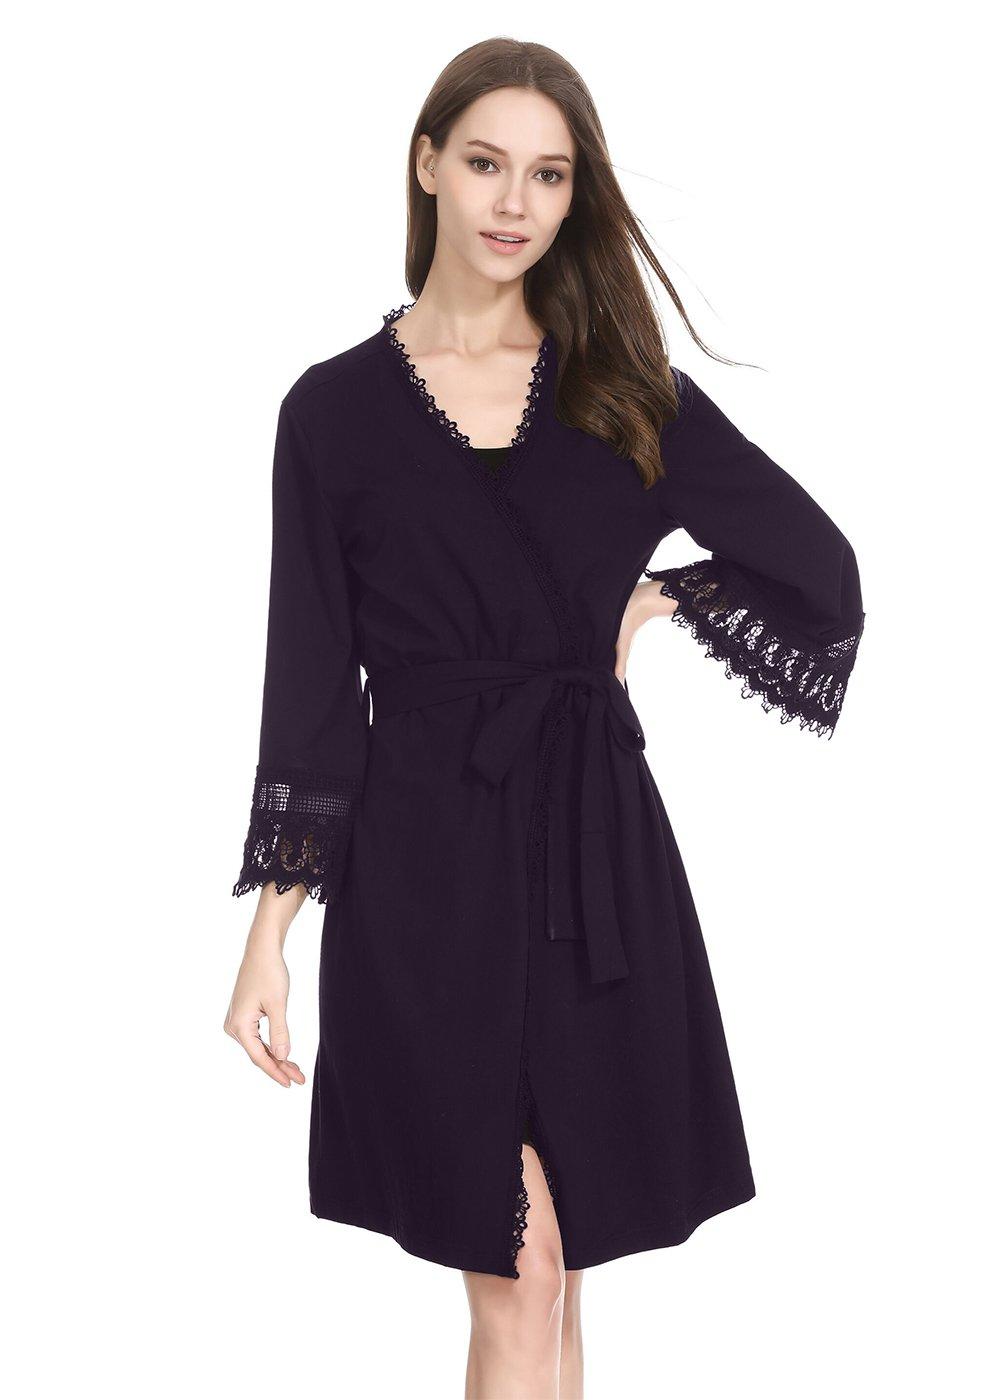 lantisan Cotton Soft Robes for Women, Long Kimono Full Length Dressing Gown